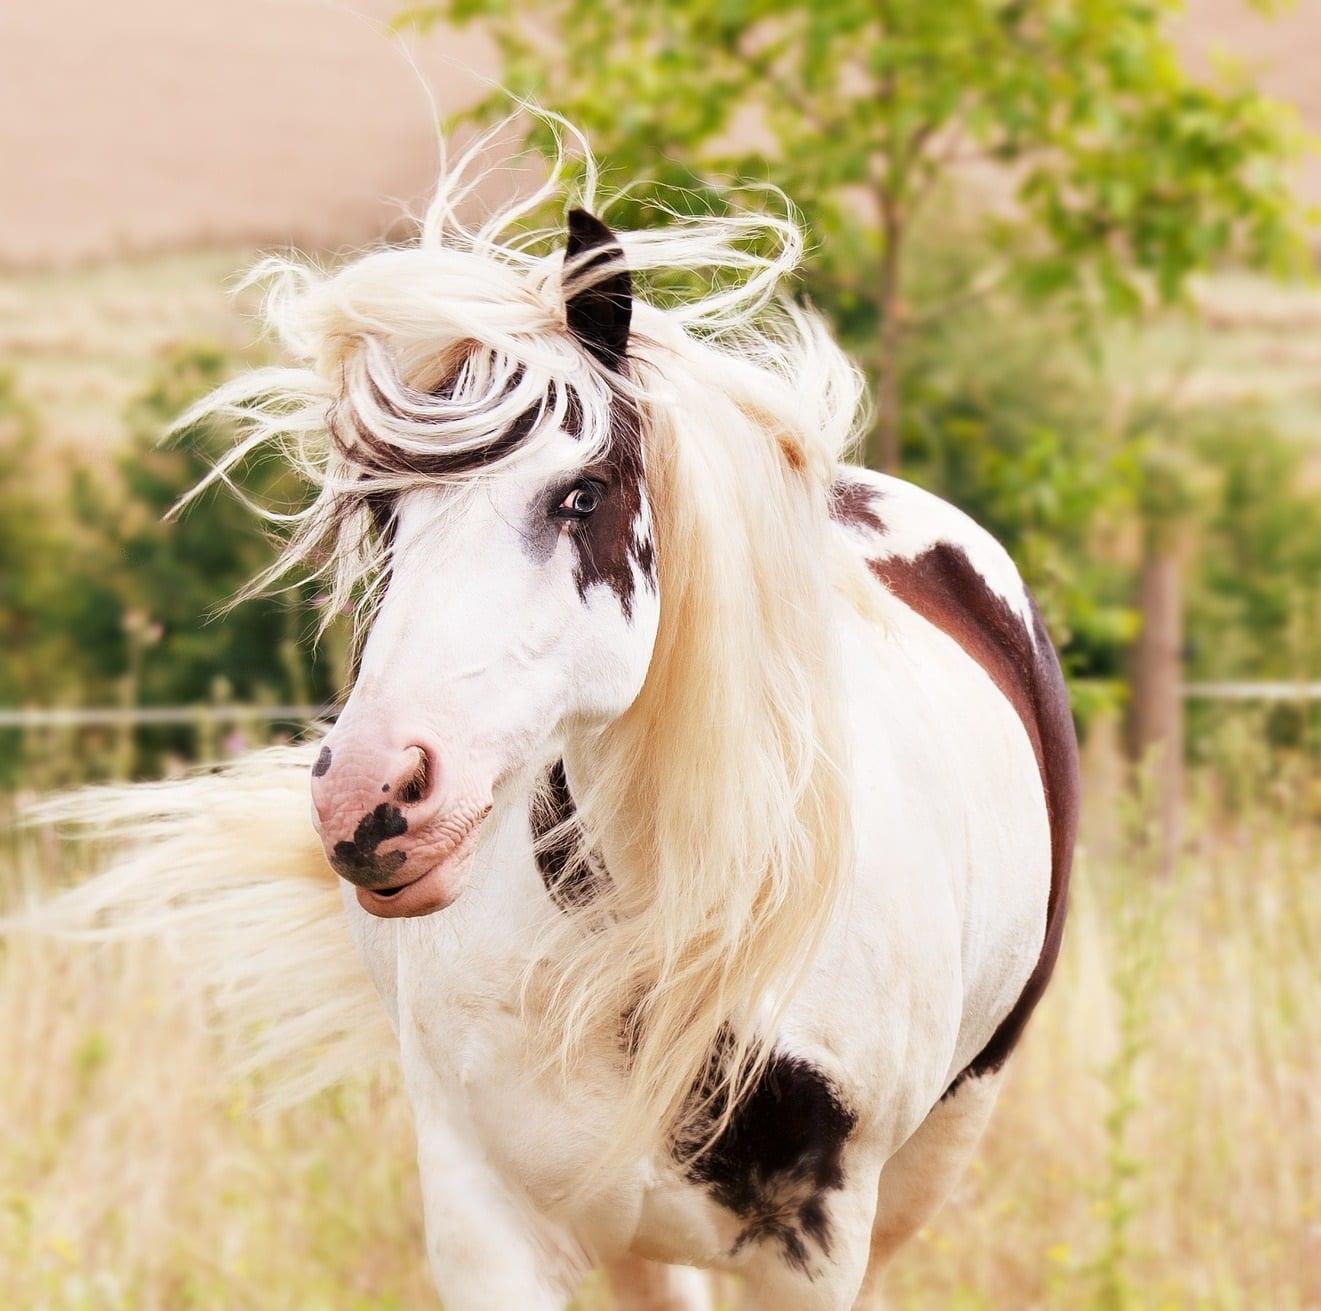 4 Ways to Braid Your Horse's Mane